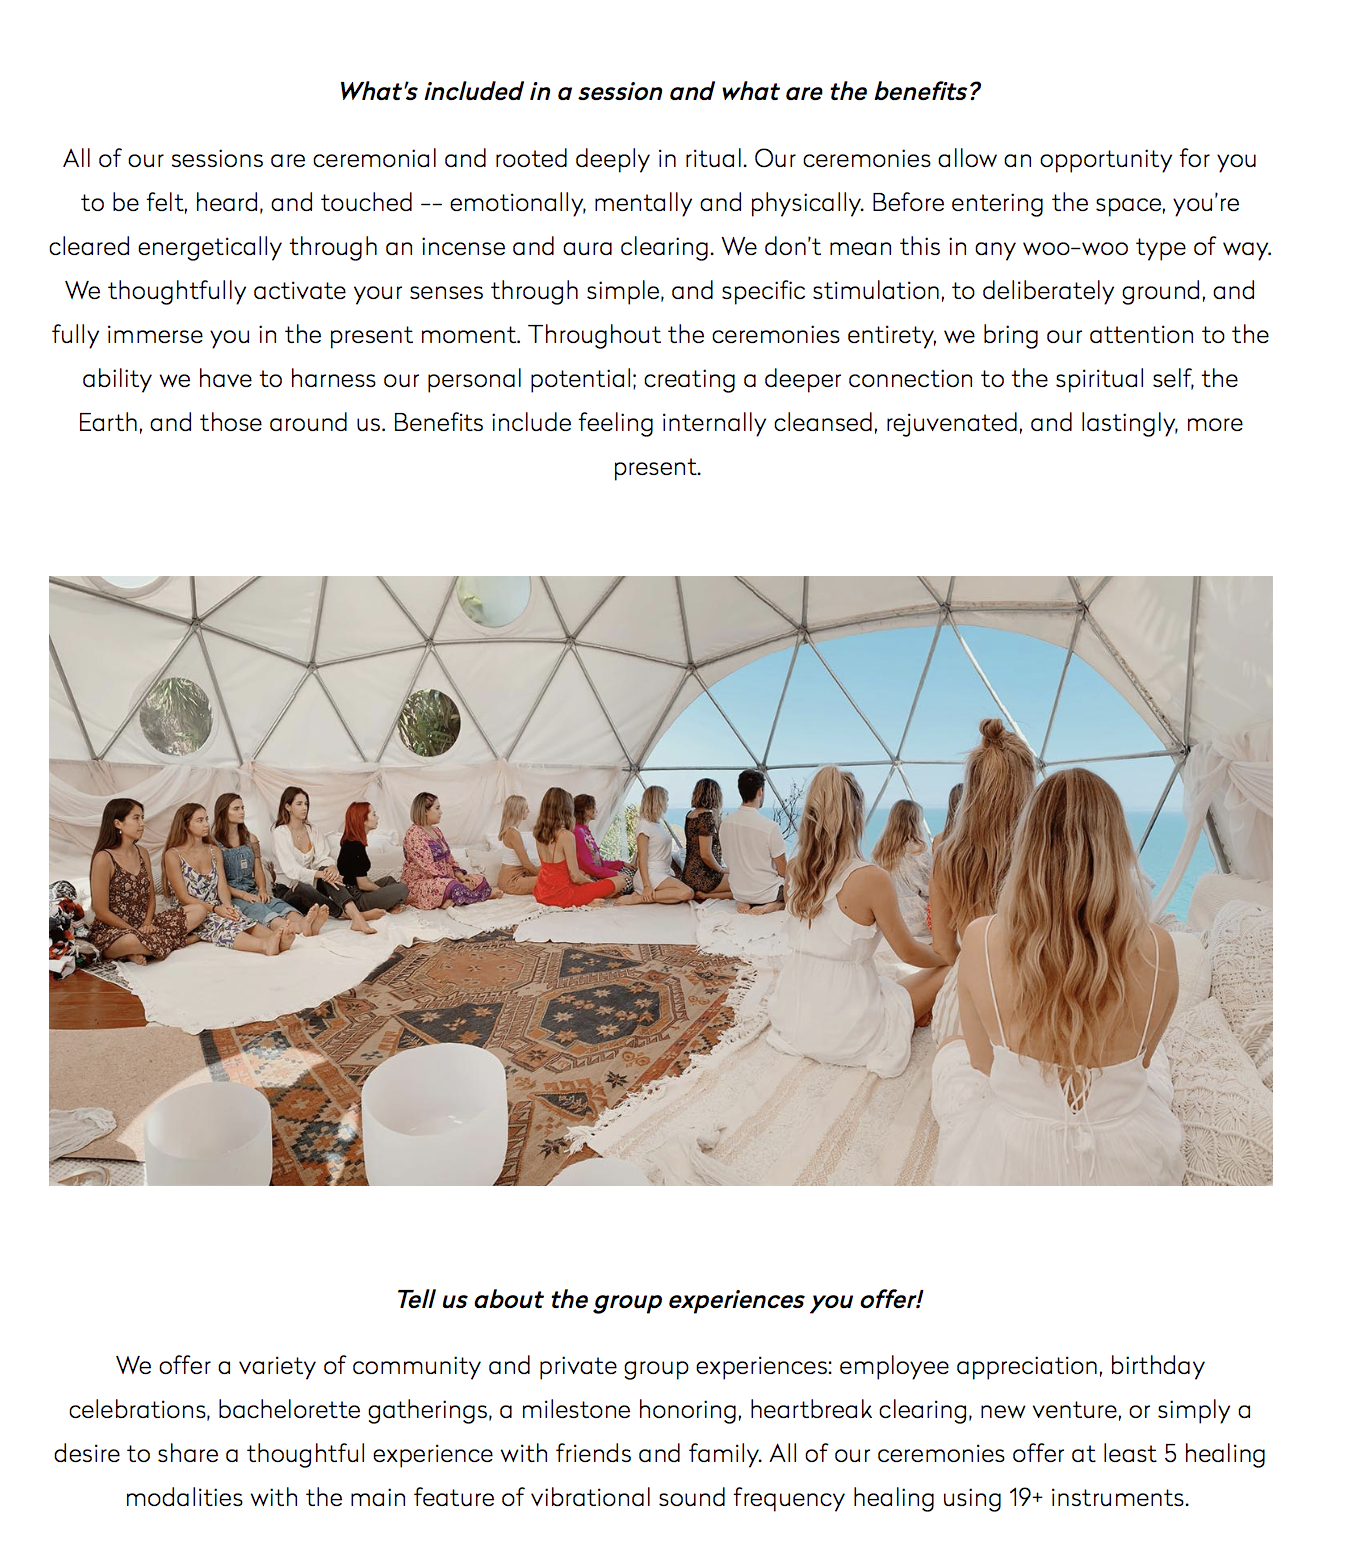 five sense collective venuse report malibu sound bath healing haven 4.png